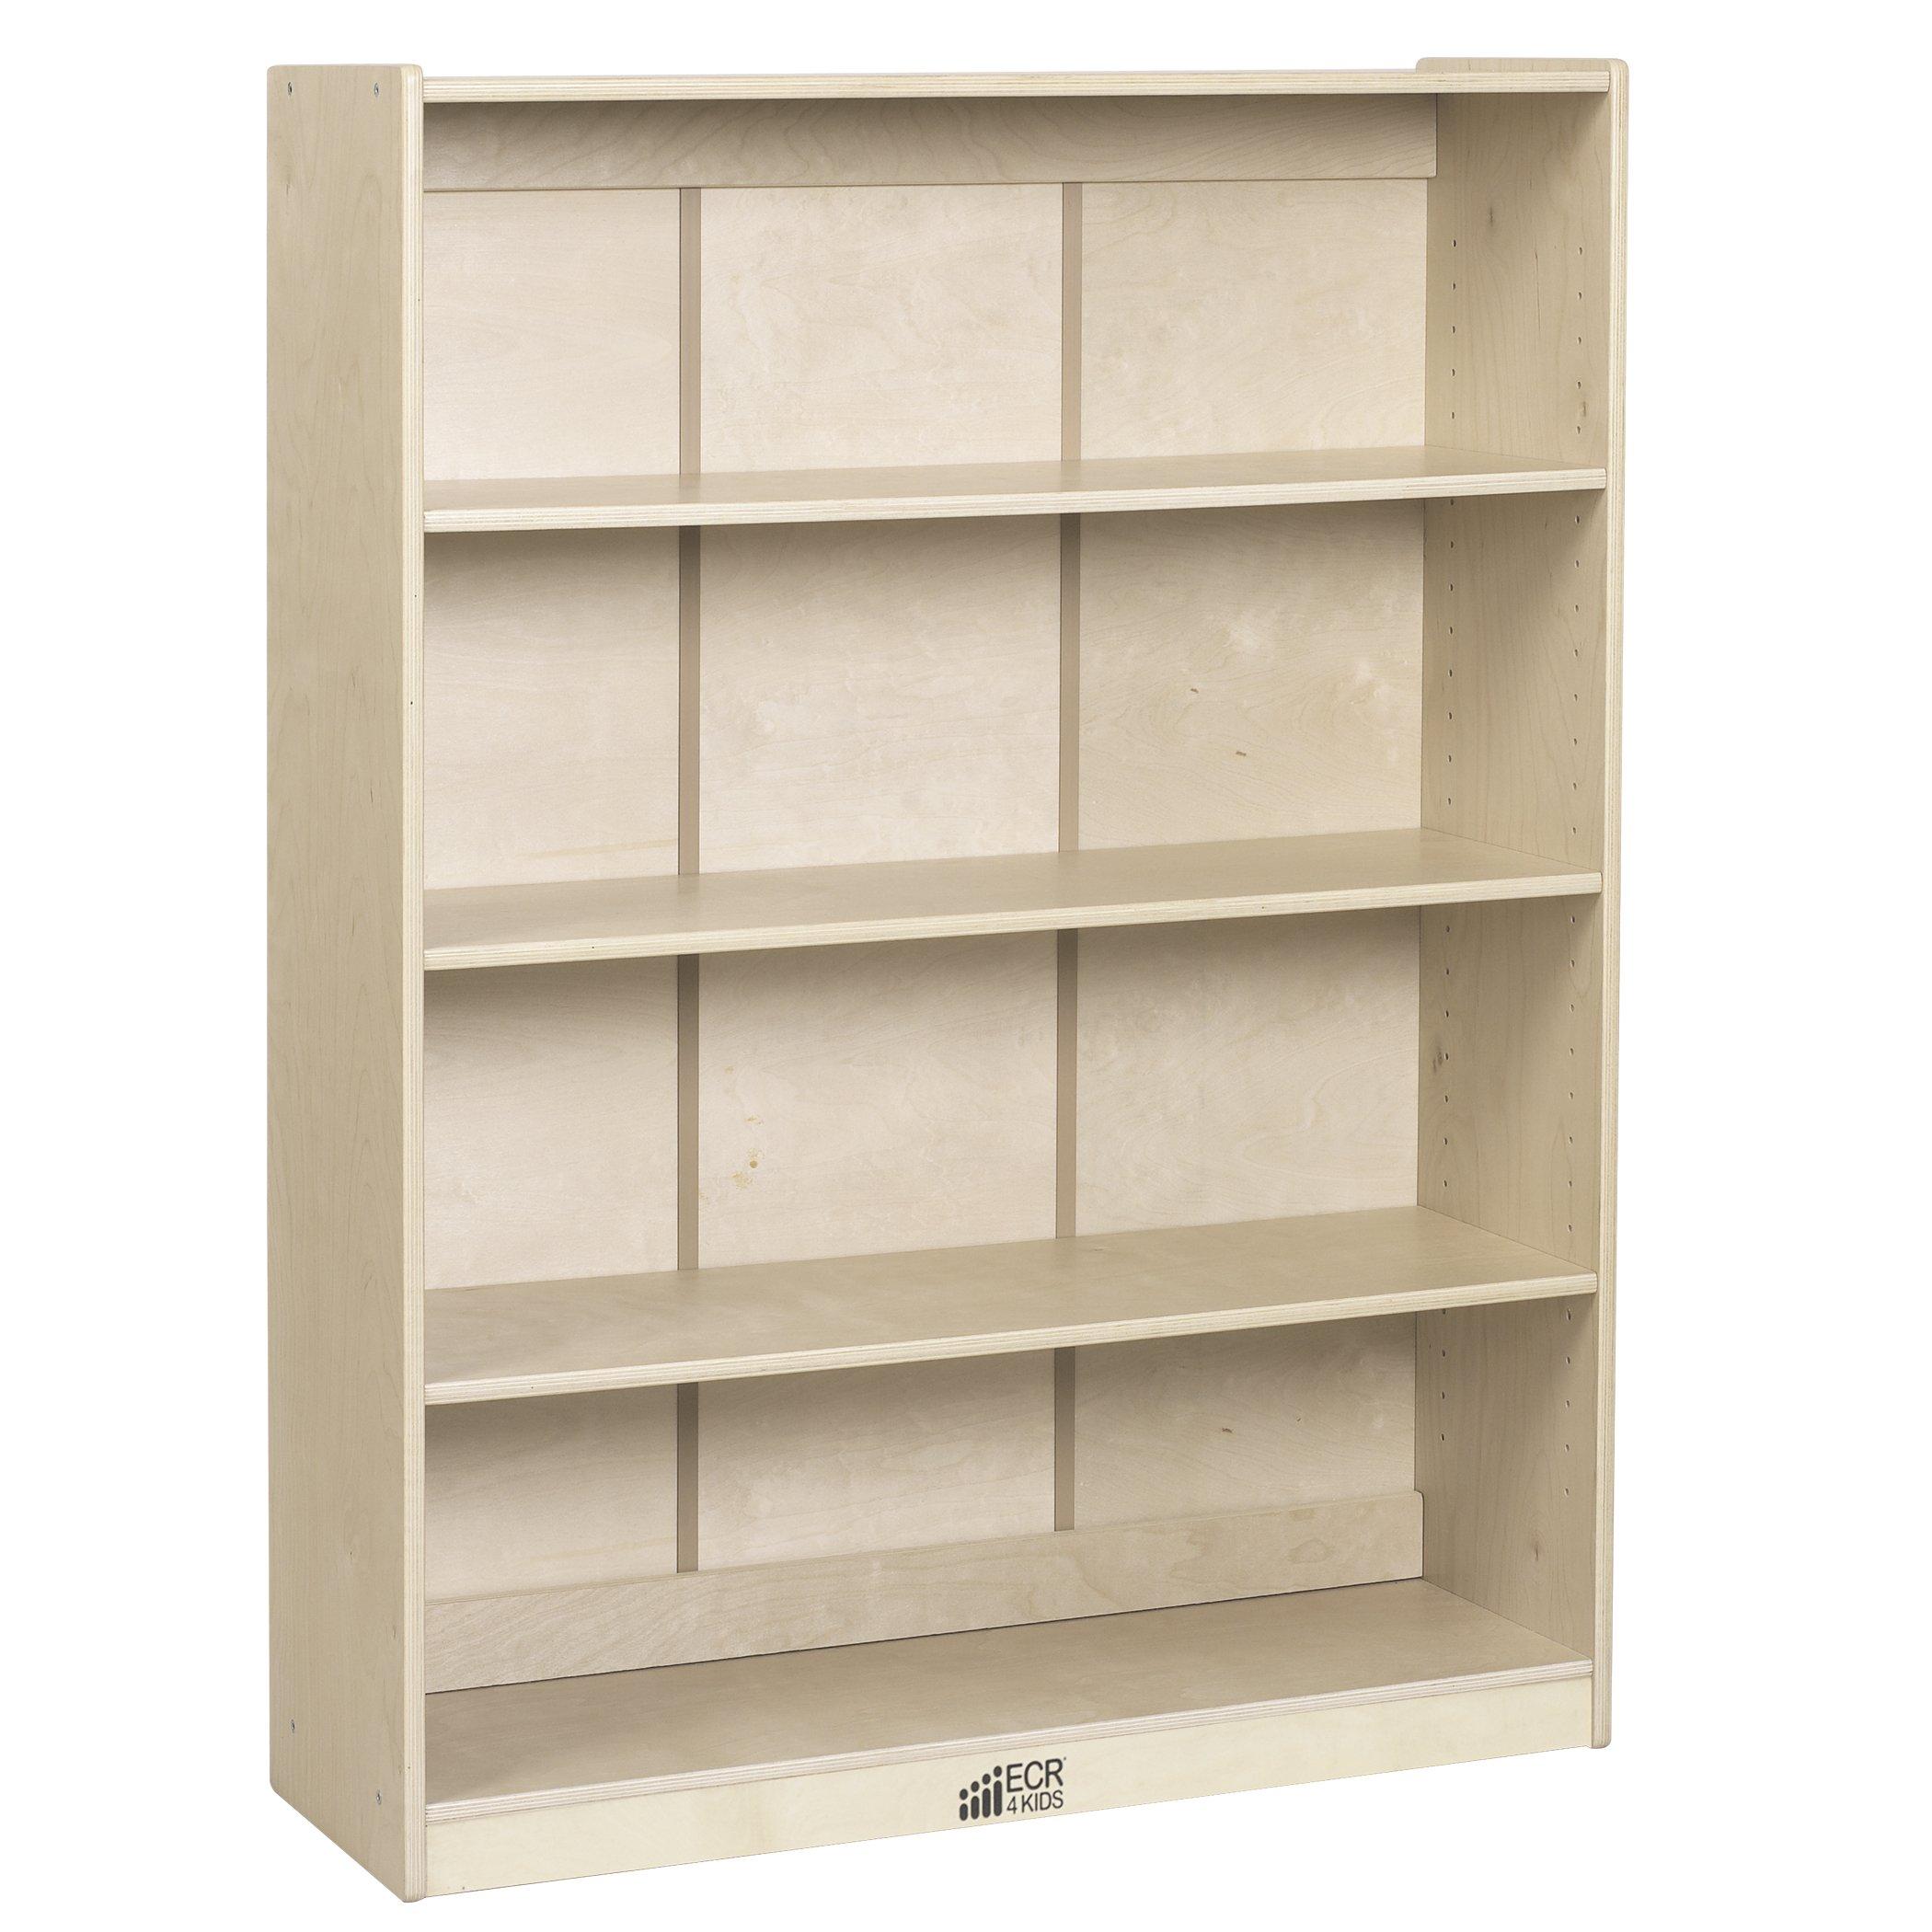 ECR4Kids Birch Bookcase with Adjustable Shelves, Wood Book Shelf Organizer for Kids, 3 Shelf, Natural, 48'' H by ECR4Kids